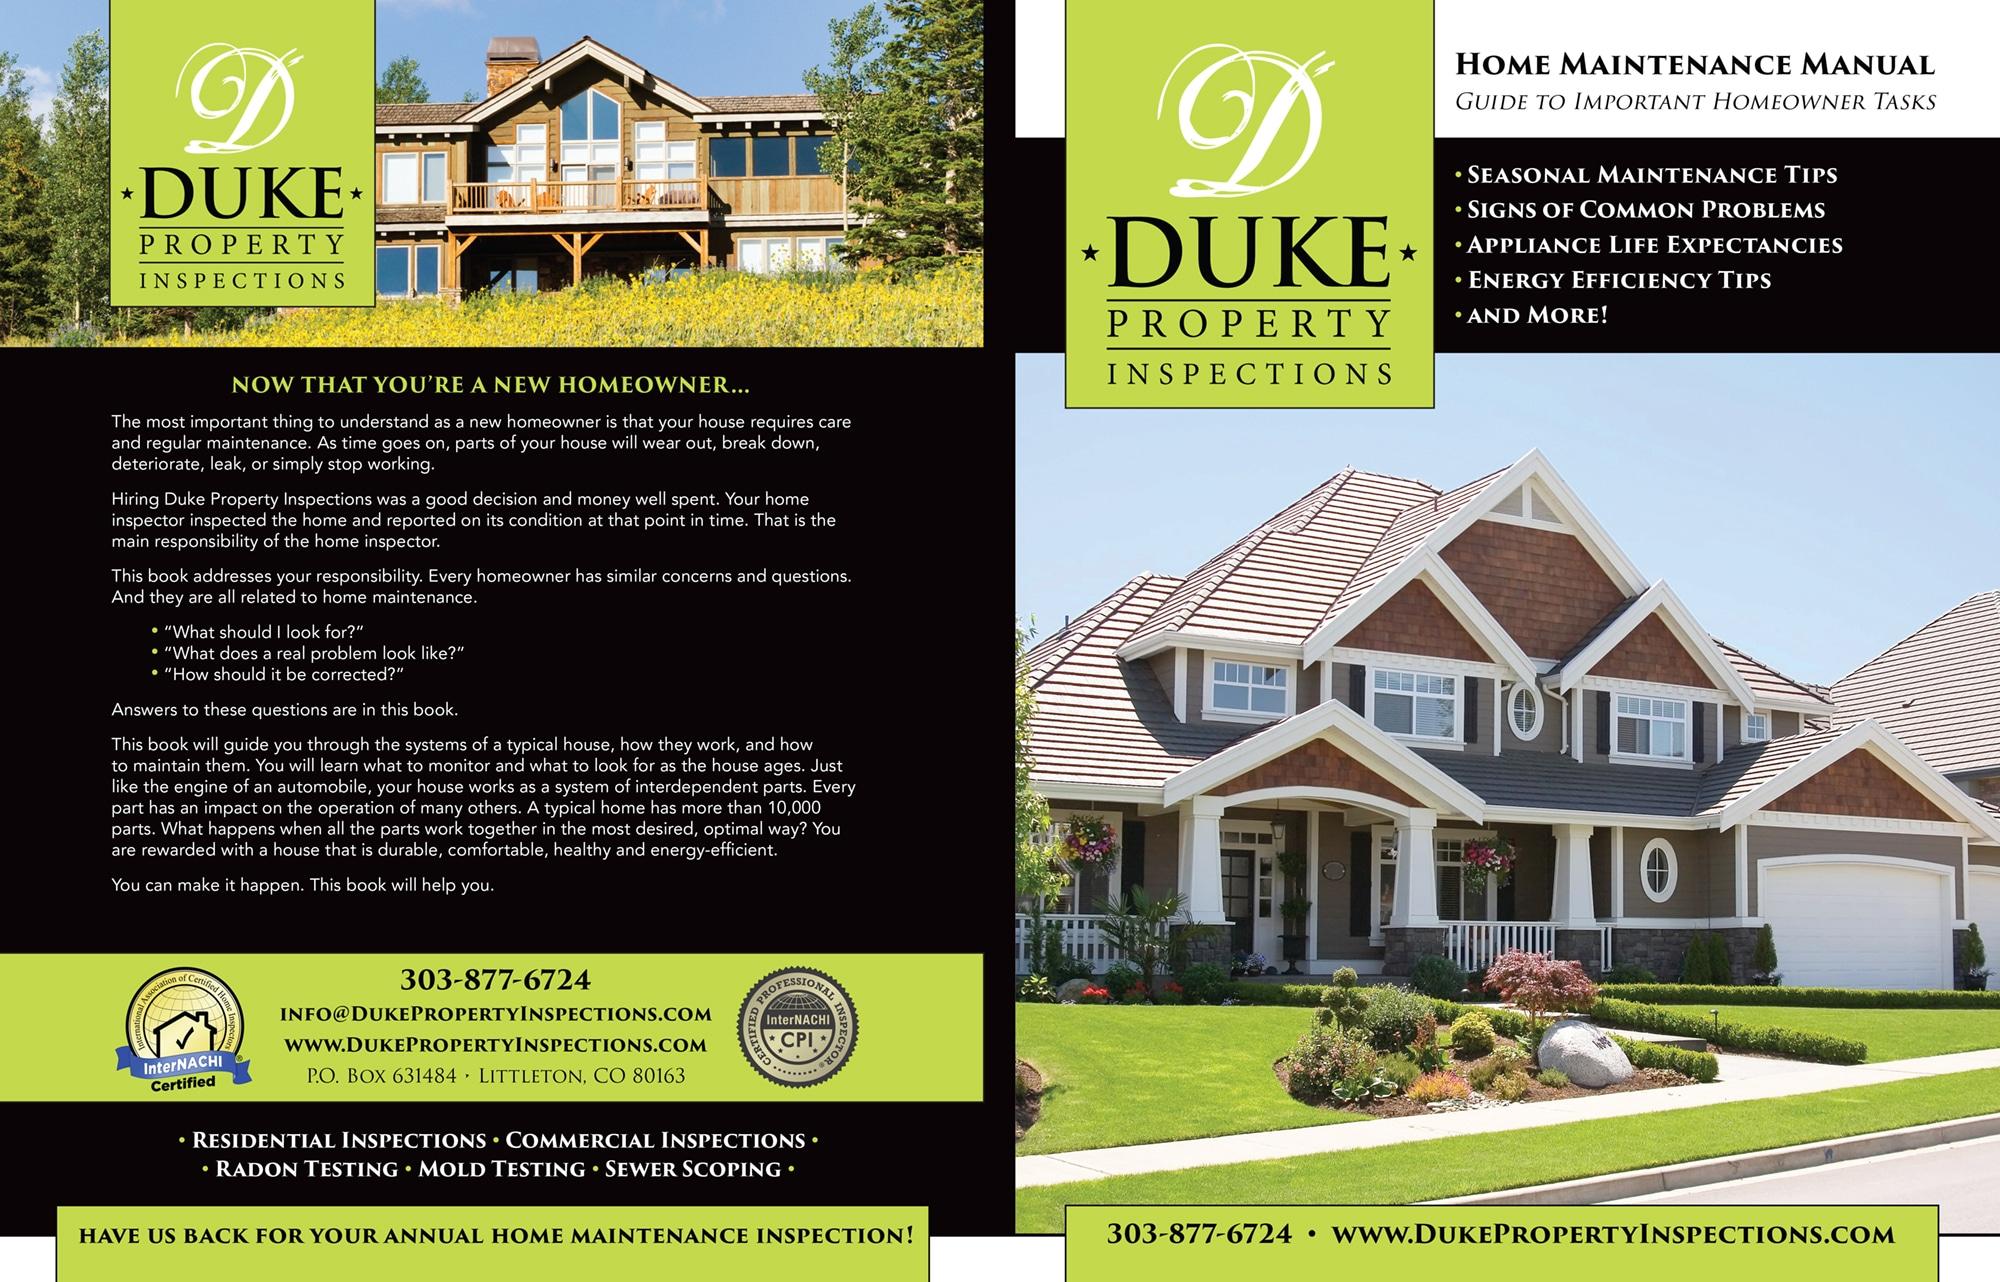 Custom Home Maintenance Books Beehive Home Inspections